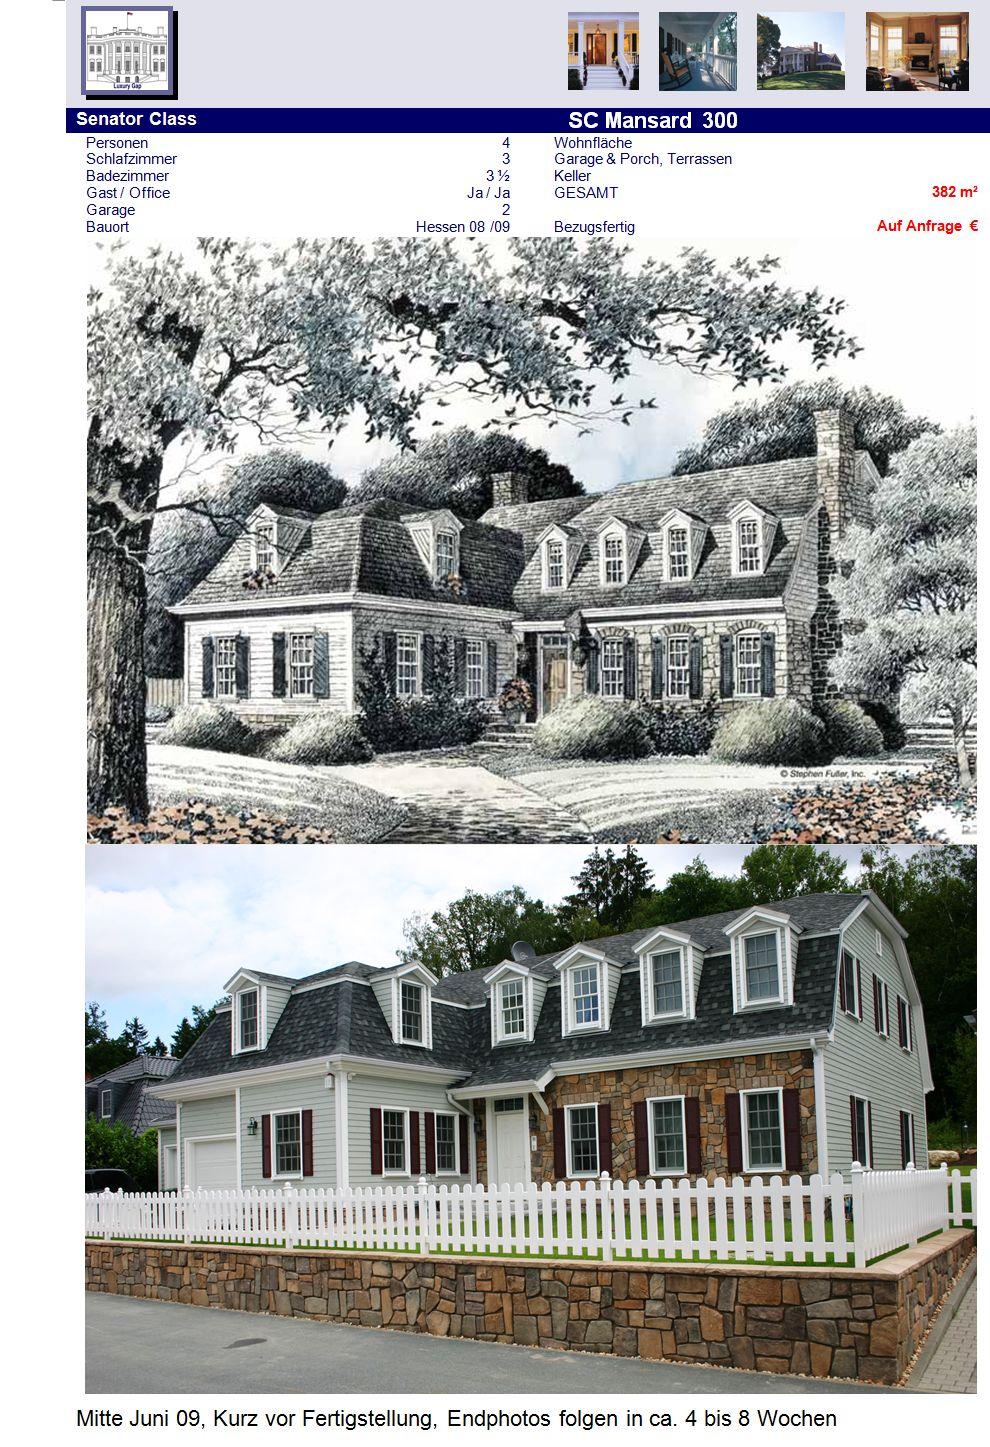 amerikanische holzhuser amerikanische holzhauser. Black Bedroom Furniture Sets. Home Design Ideas